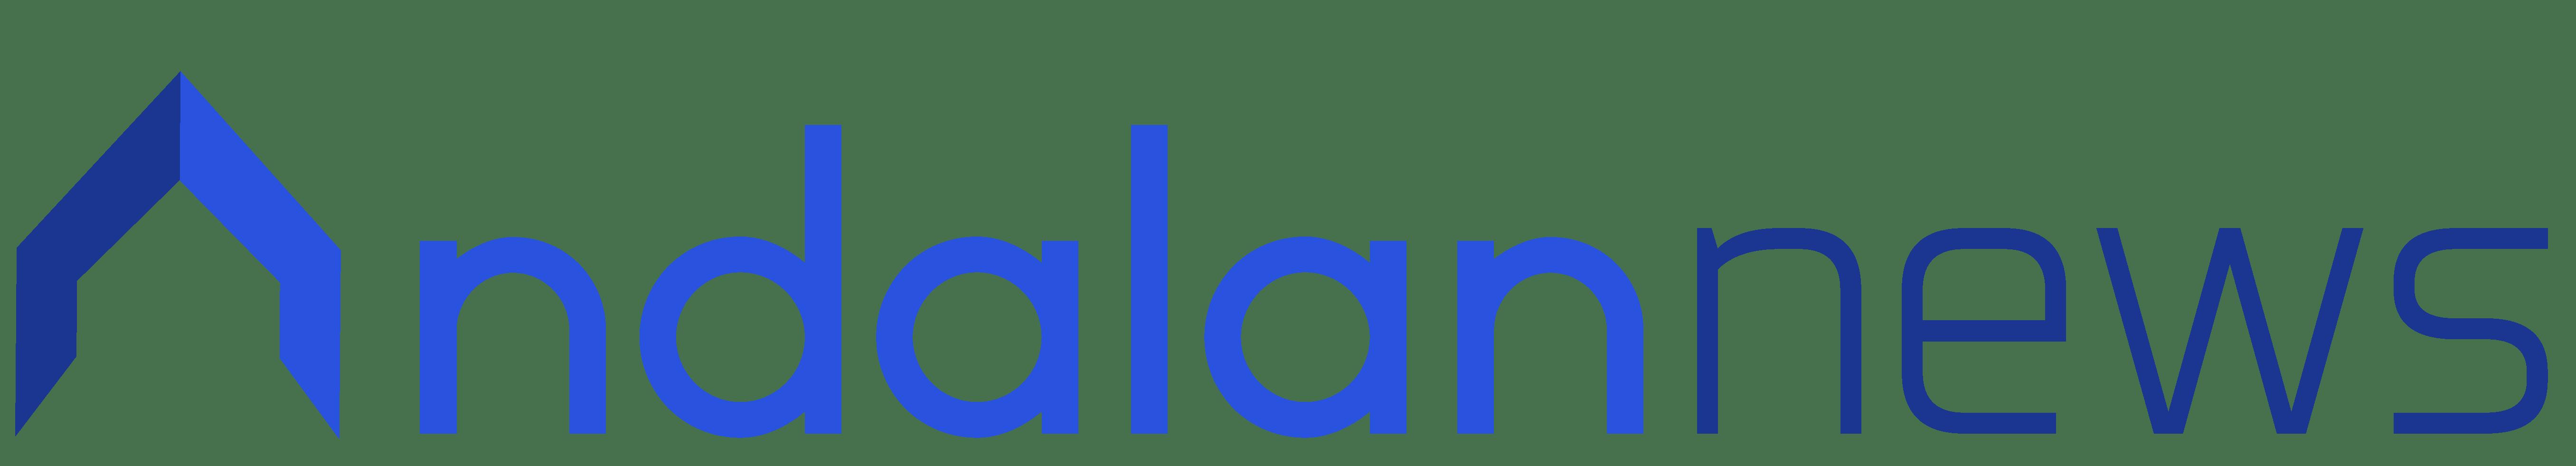 Logo Andalan News - Full High Resolution